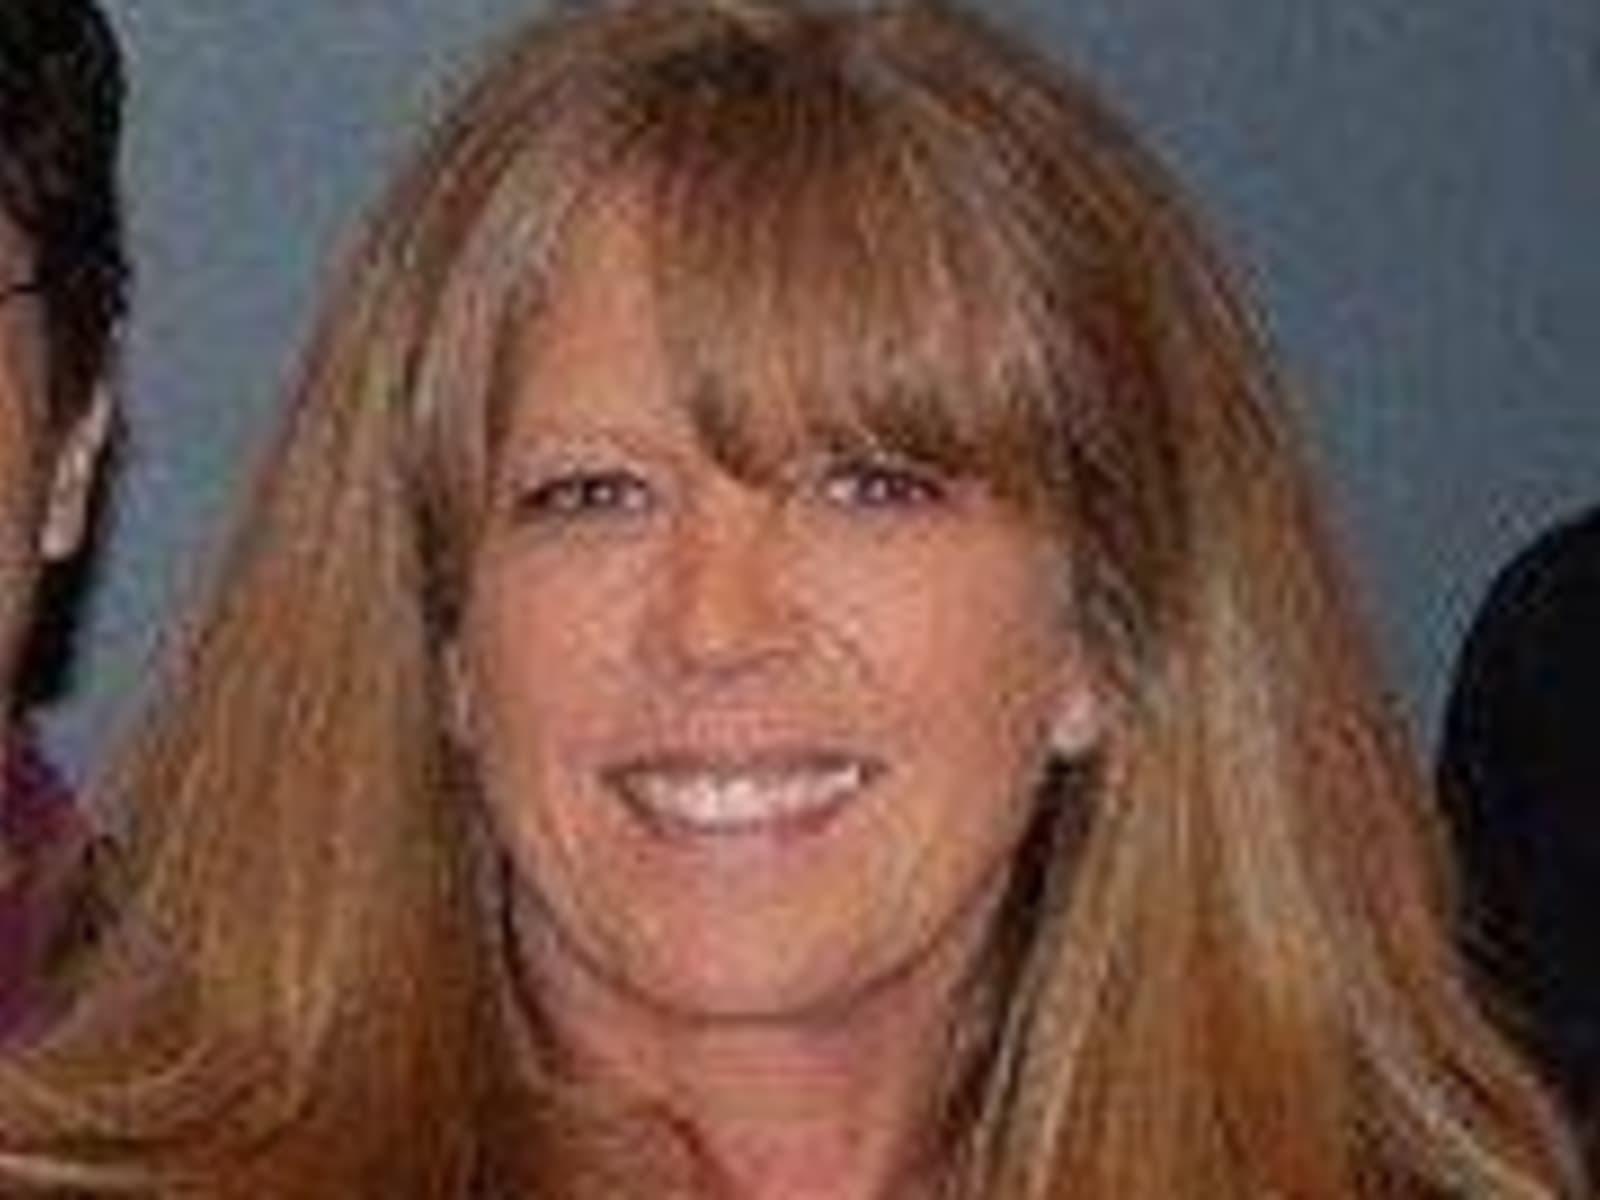 Susan from Leavenworth, Kansas, United States